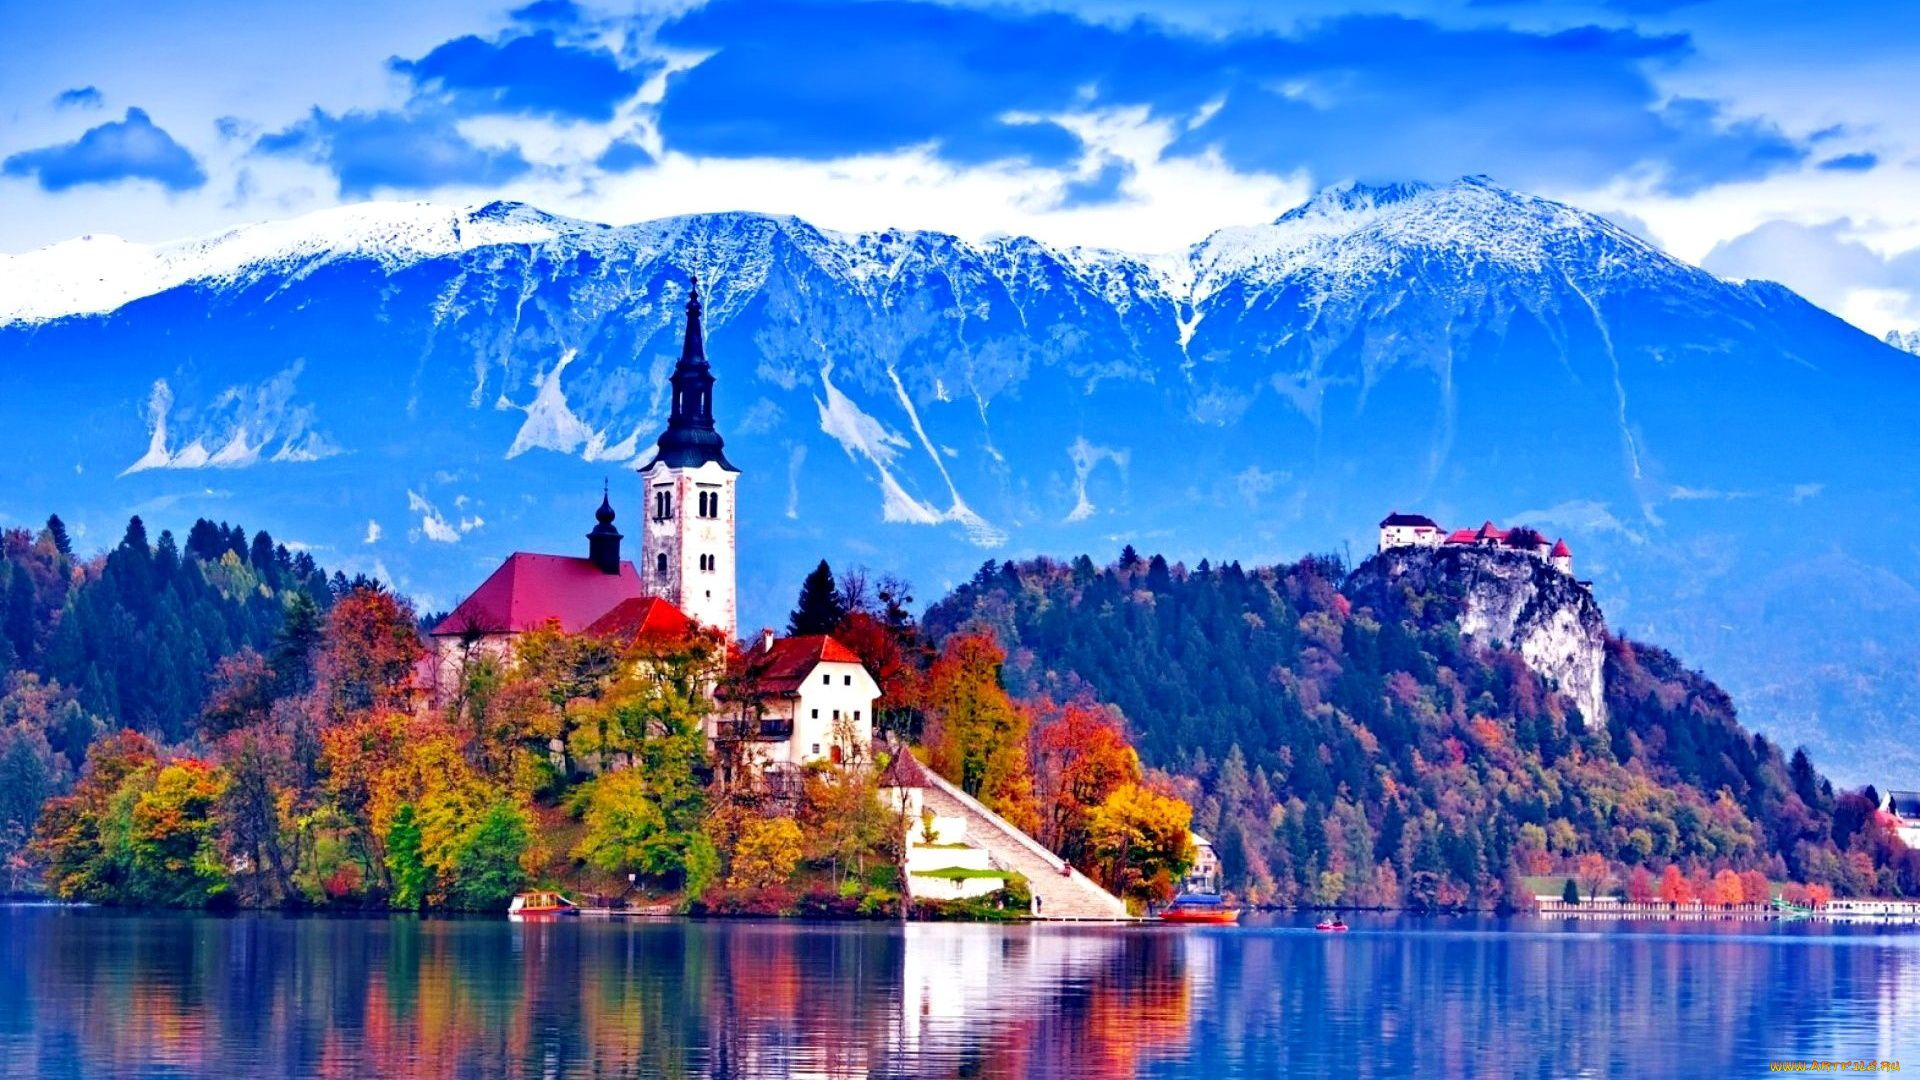 Europe Cool HD Wallpaper